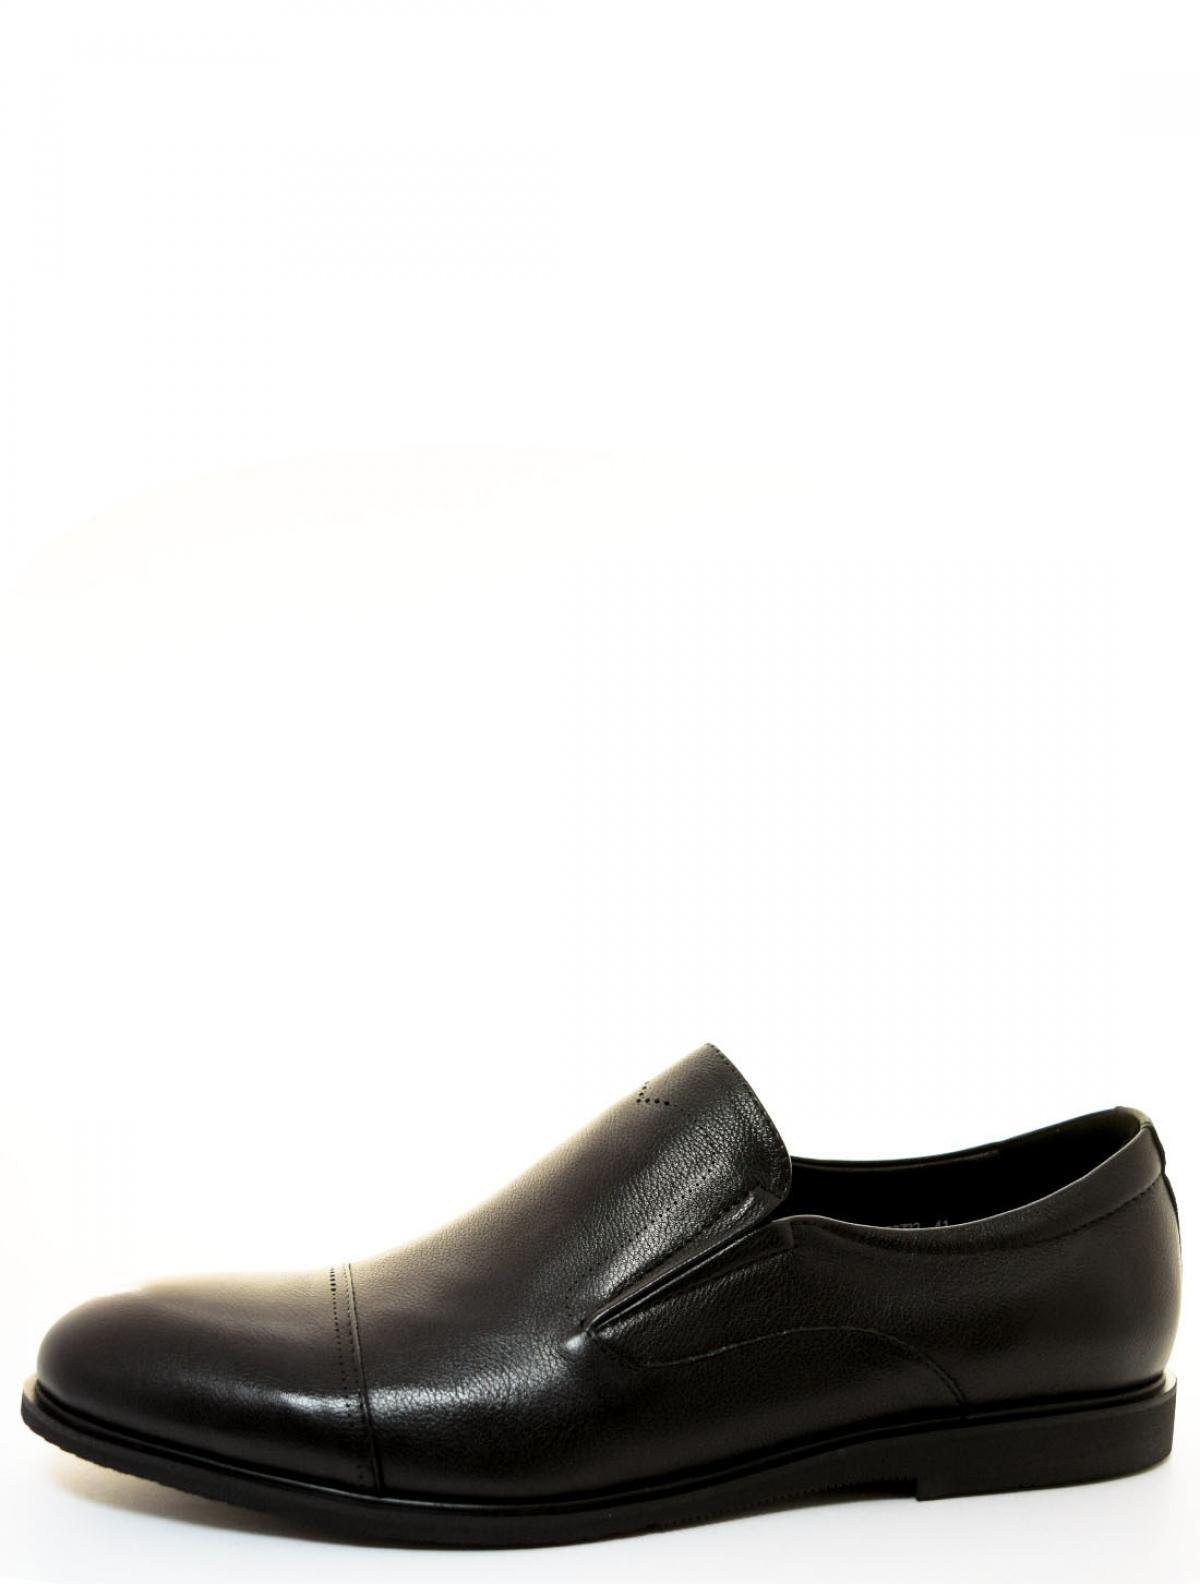 Roscote B189-B42-SG3-T2722 мужские туфли